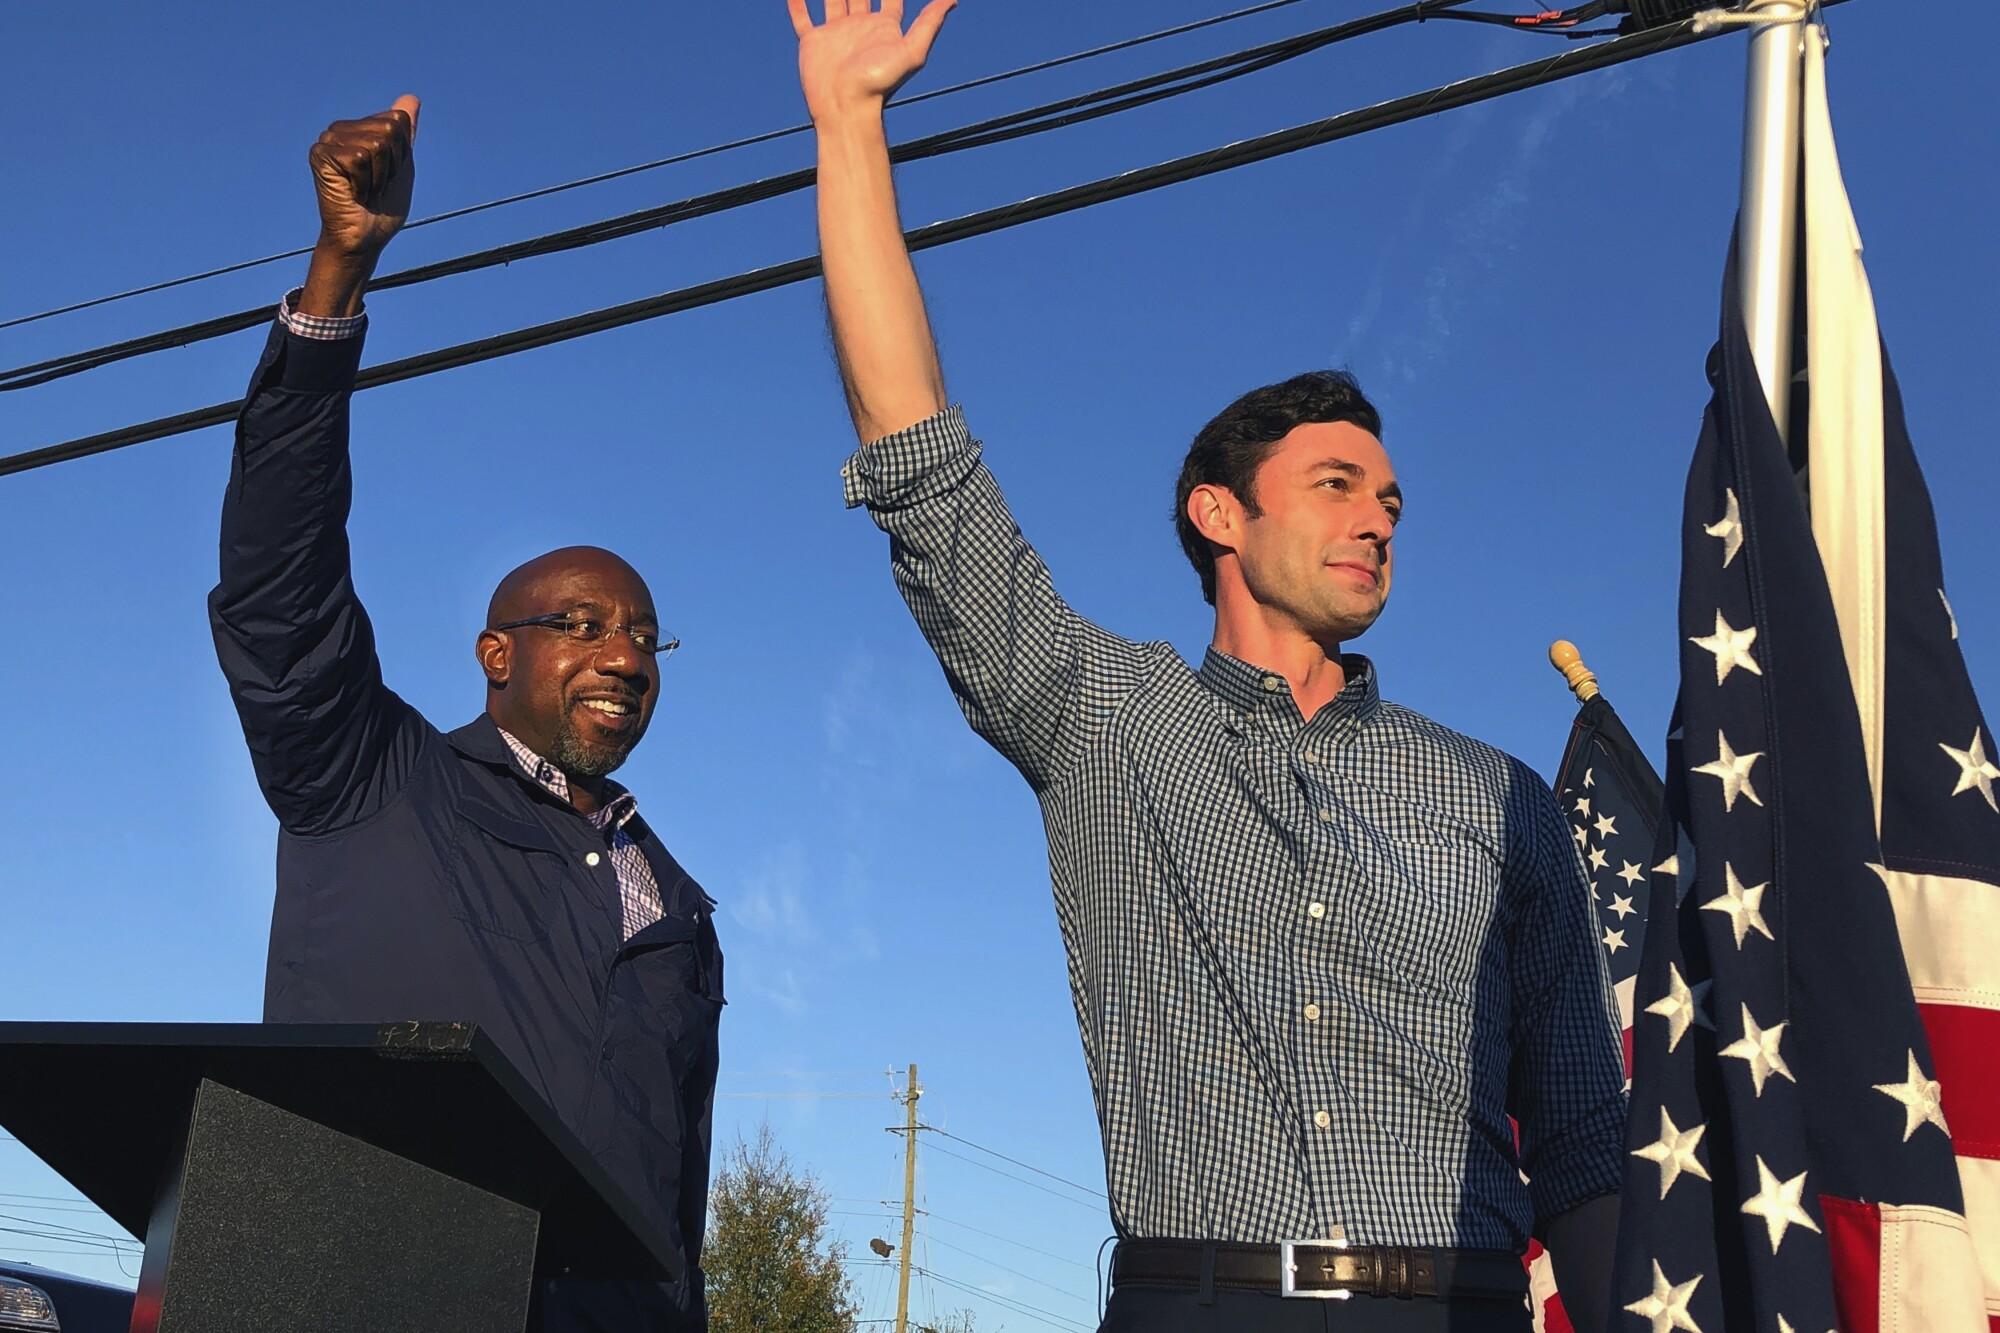 Democratic U.S. Senate candidates Raphael Warnock and Jon Ossoff wave to the crowd at a rally Nov. 15 in Marietta, Ga.